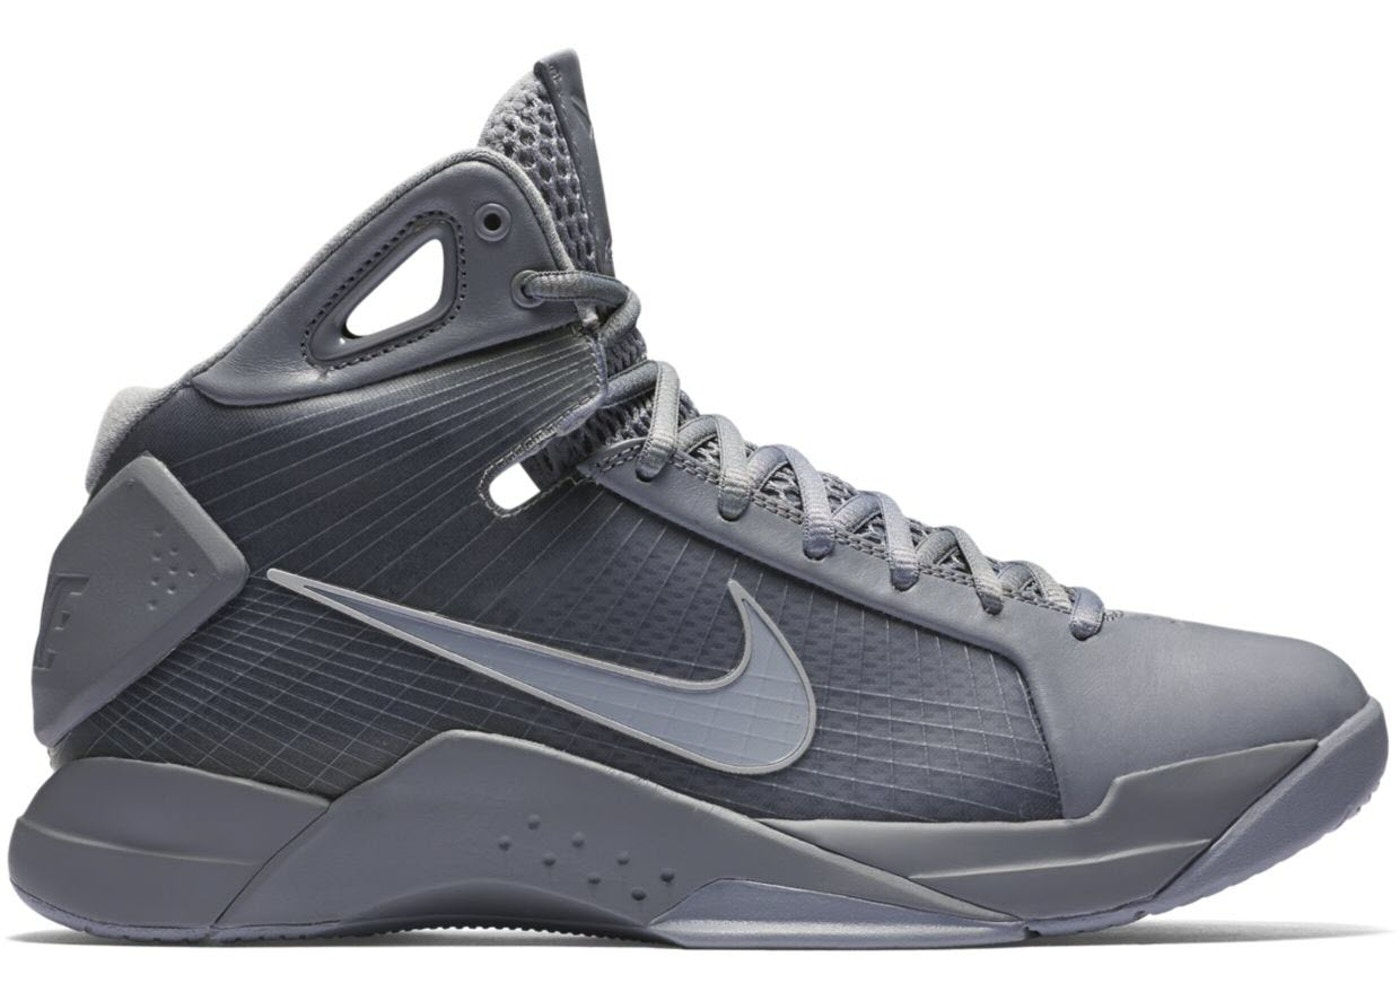 purchase cheap d70d3 95a61 Buy Nike Basketball Hyperdunk Shoes   Deadstock Sneakers